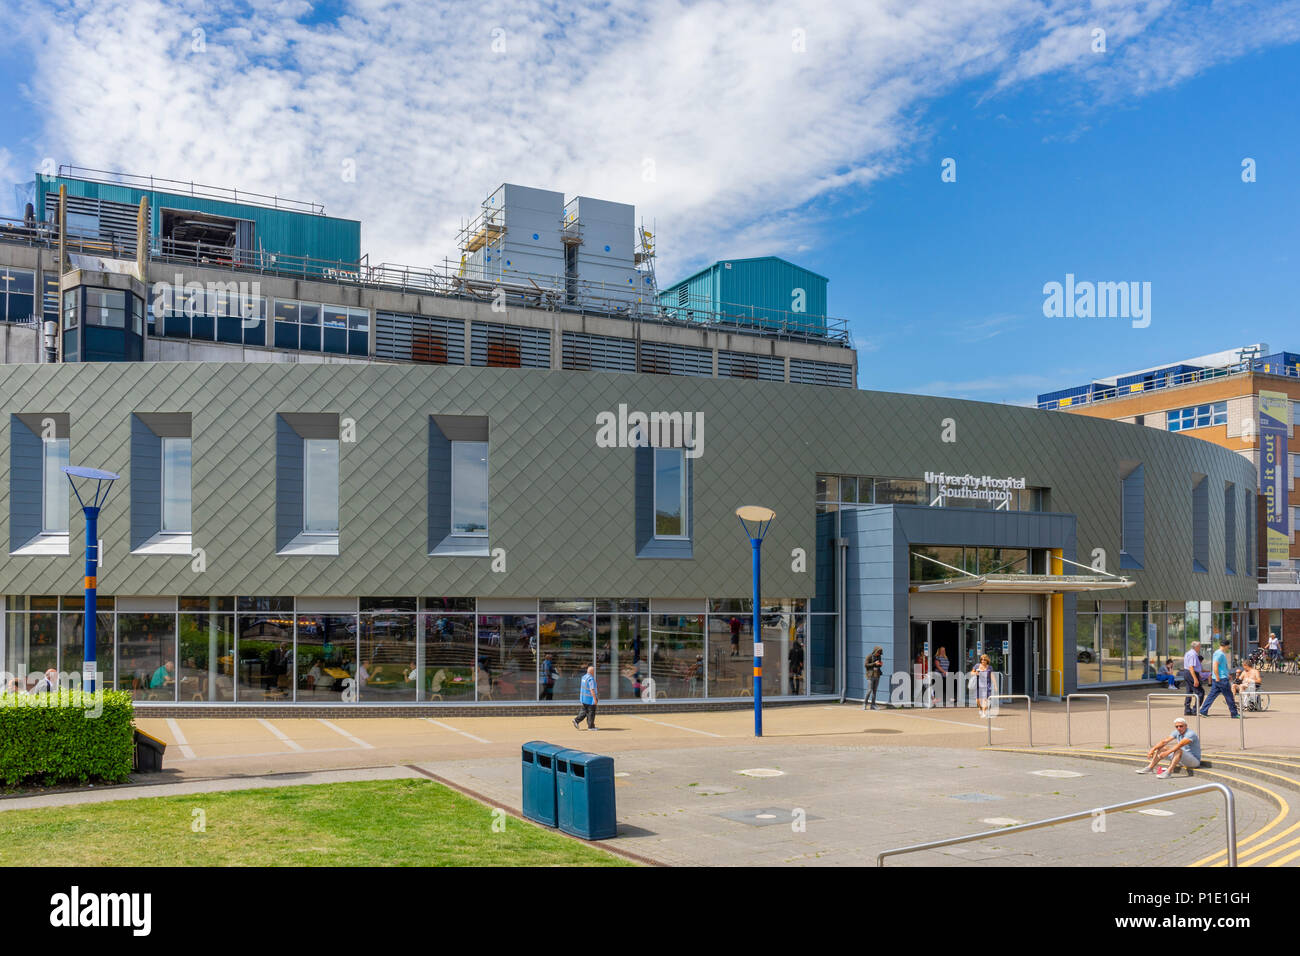 Main Entrance of the University Hospital Southampton (General Hospital) in Southampton, England, UK - Stock Image